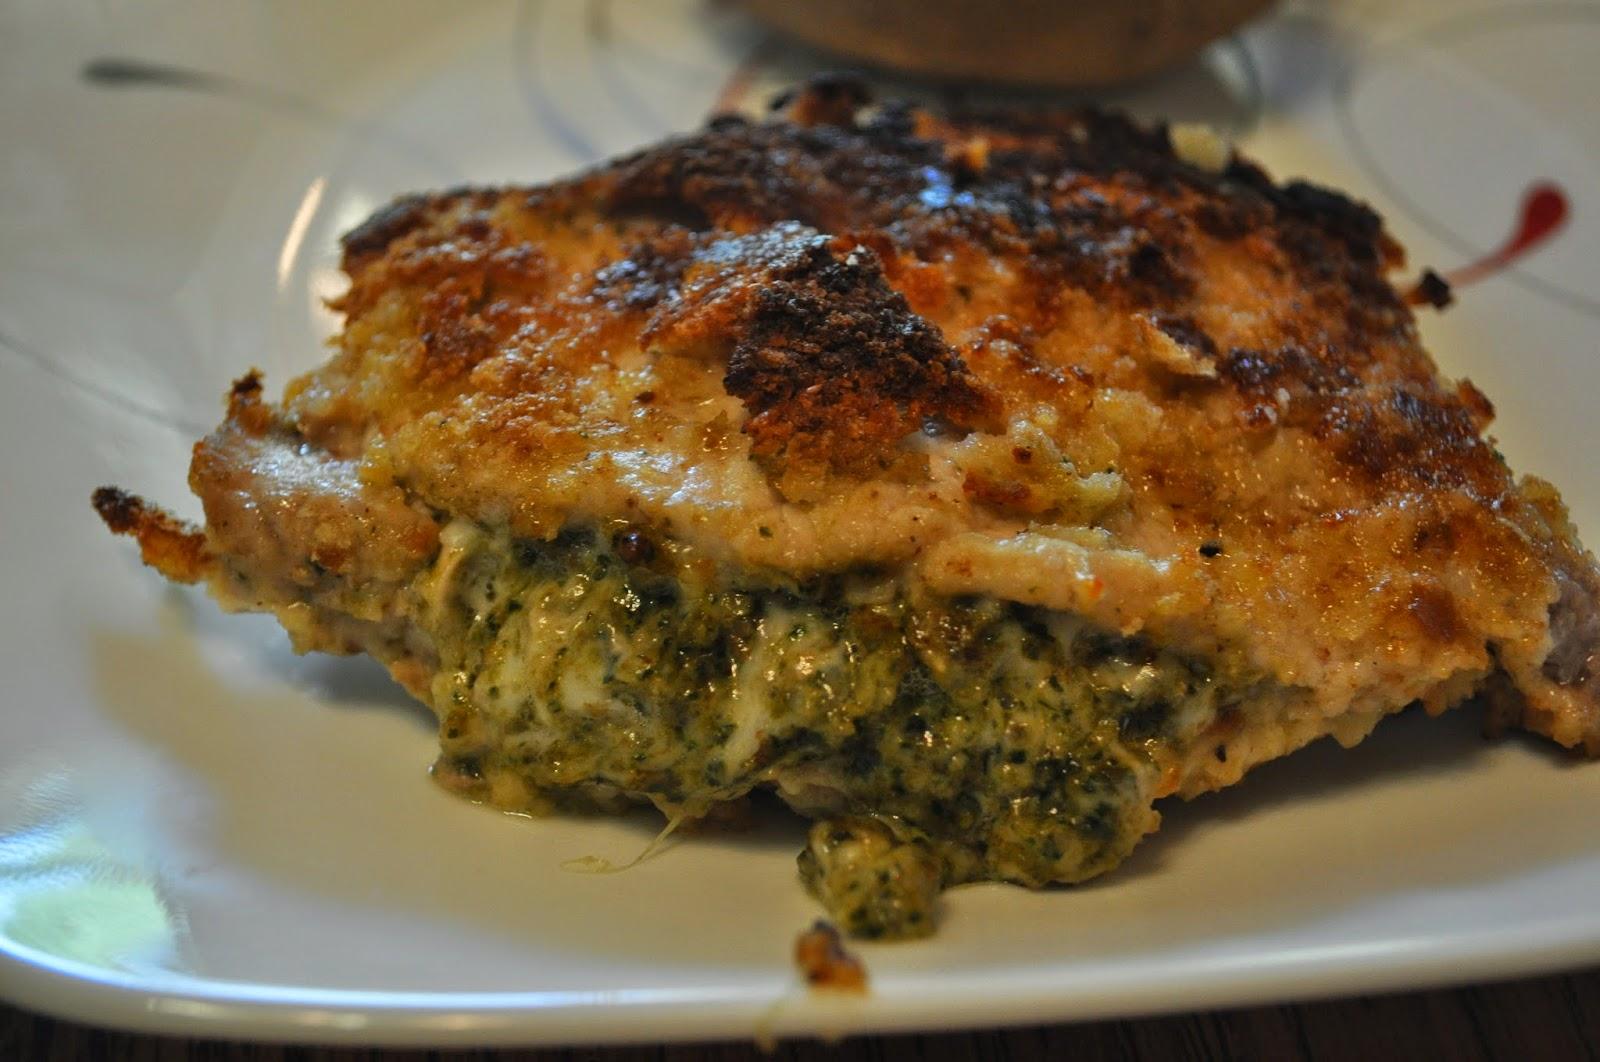 Beth's Favorite Recipes: Pesto Mozzarella Stuffed Pork Chops